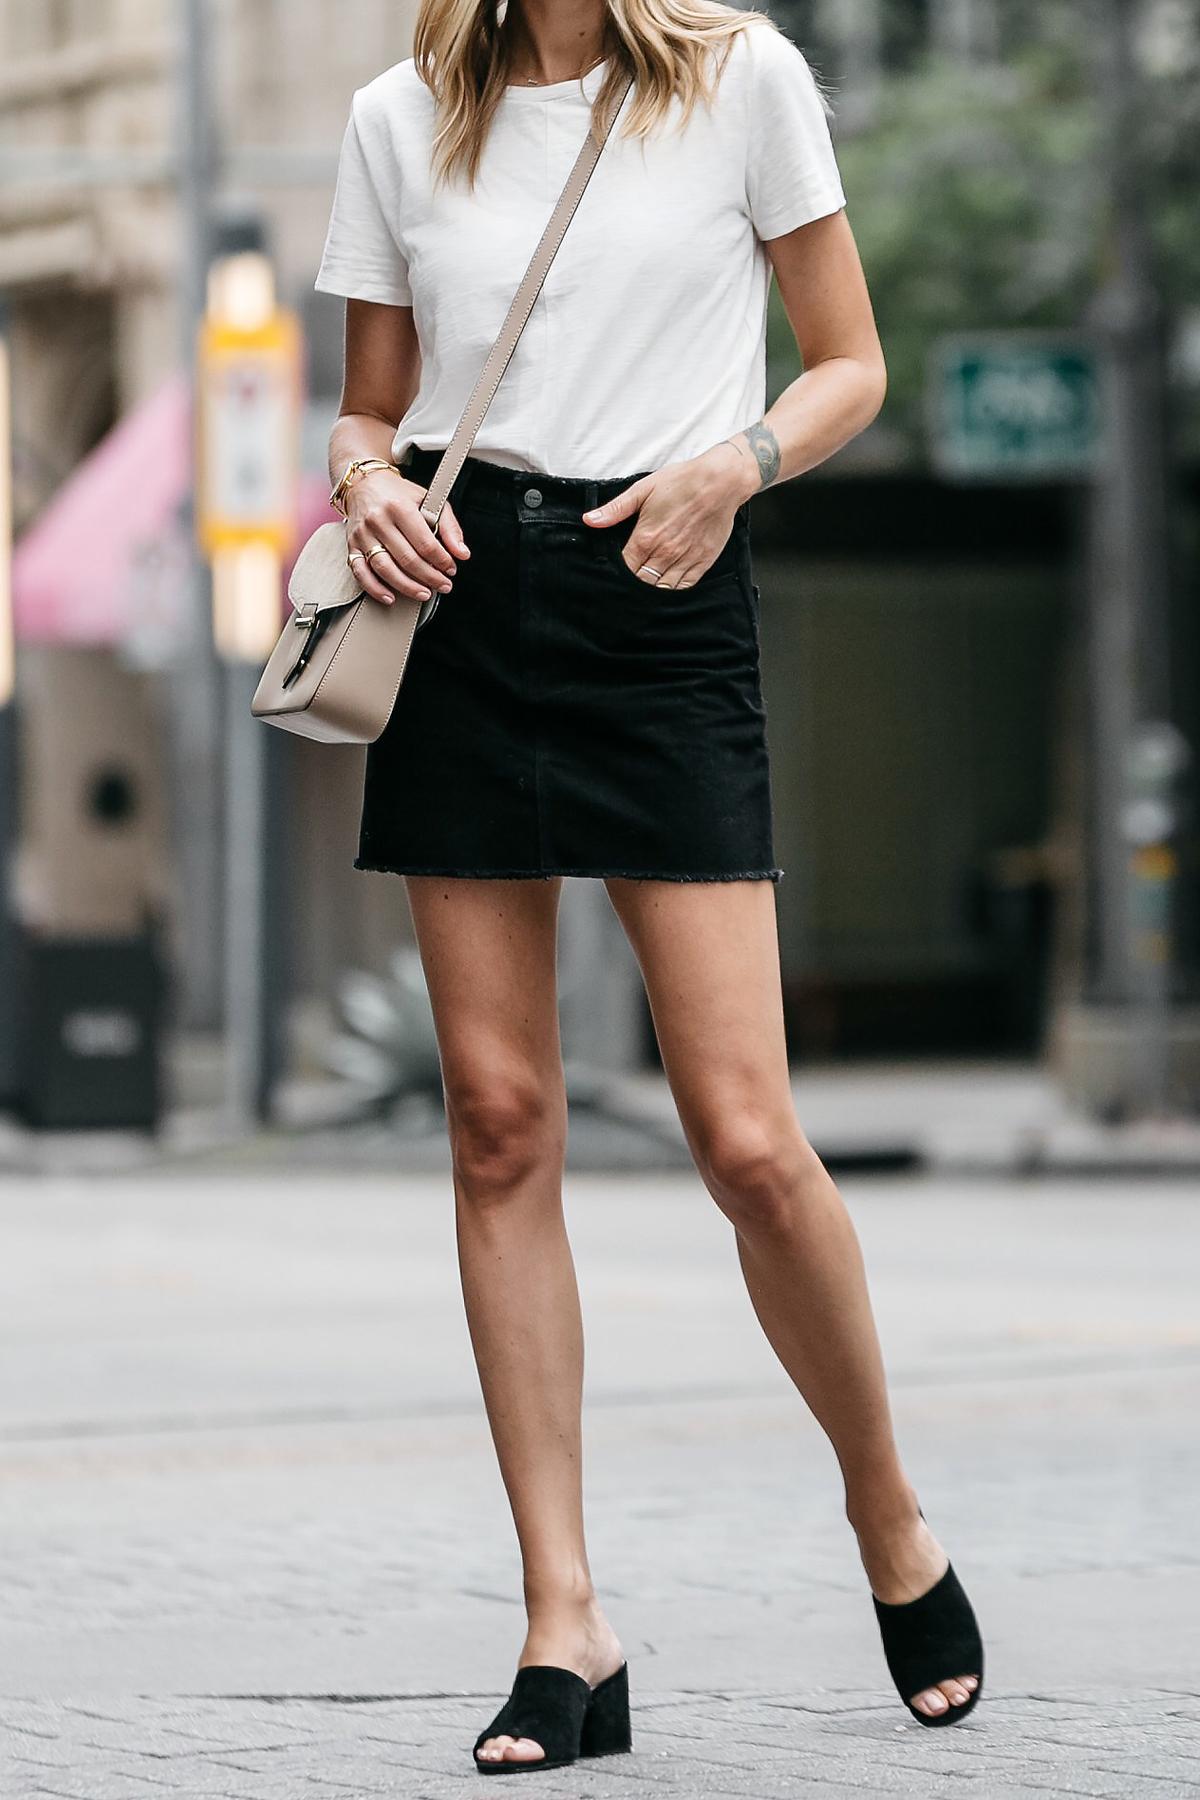 white tshirt frame black denim skirt outfit black mules tan crossbody handbag street style dallas blogger fashion blogger